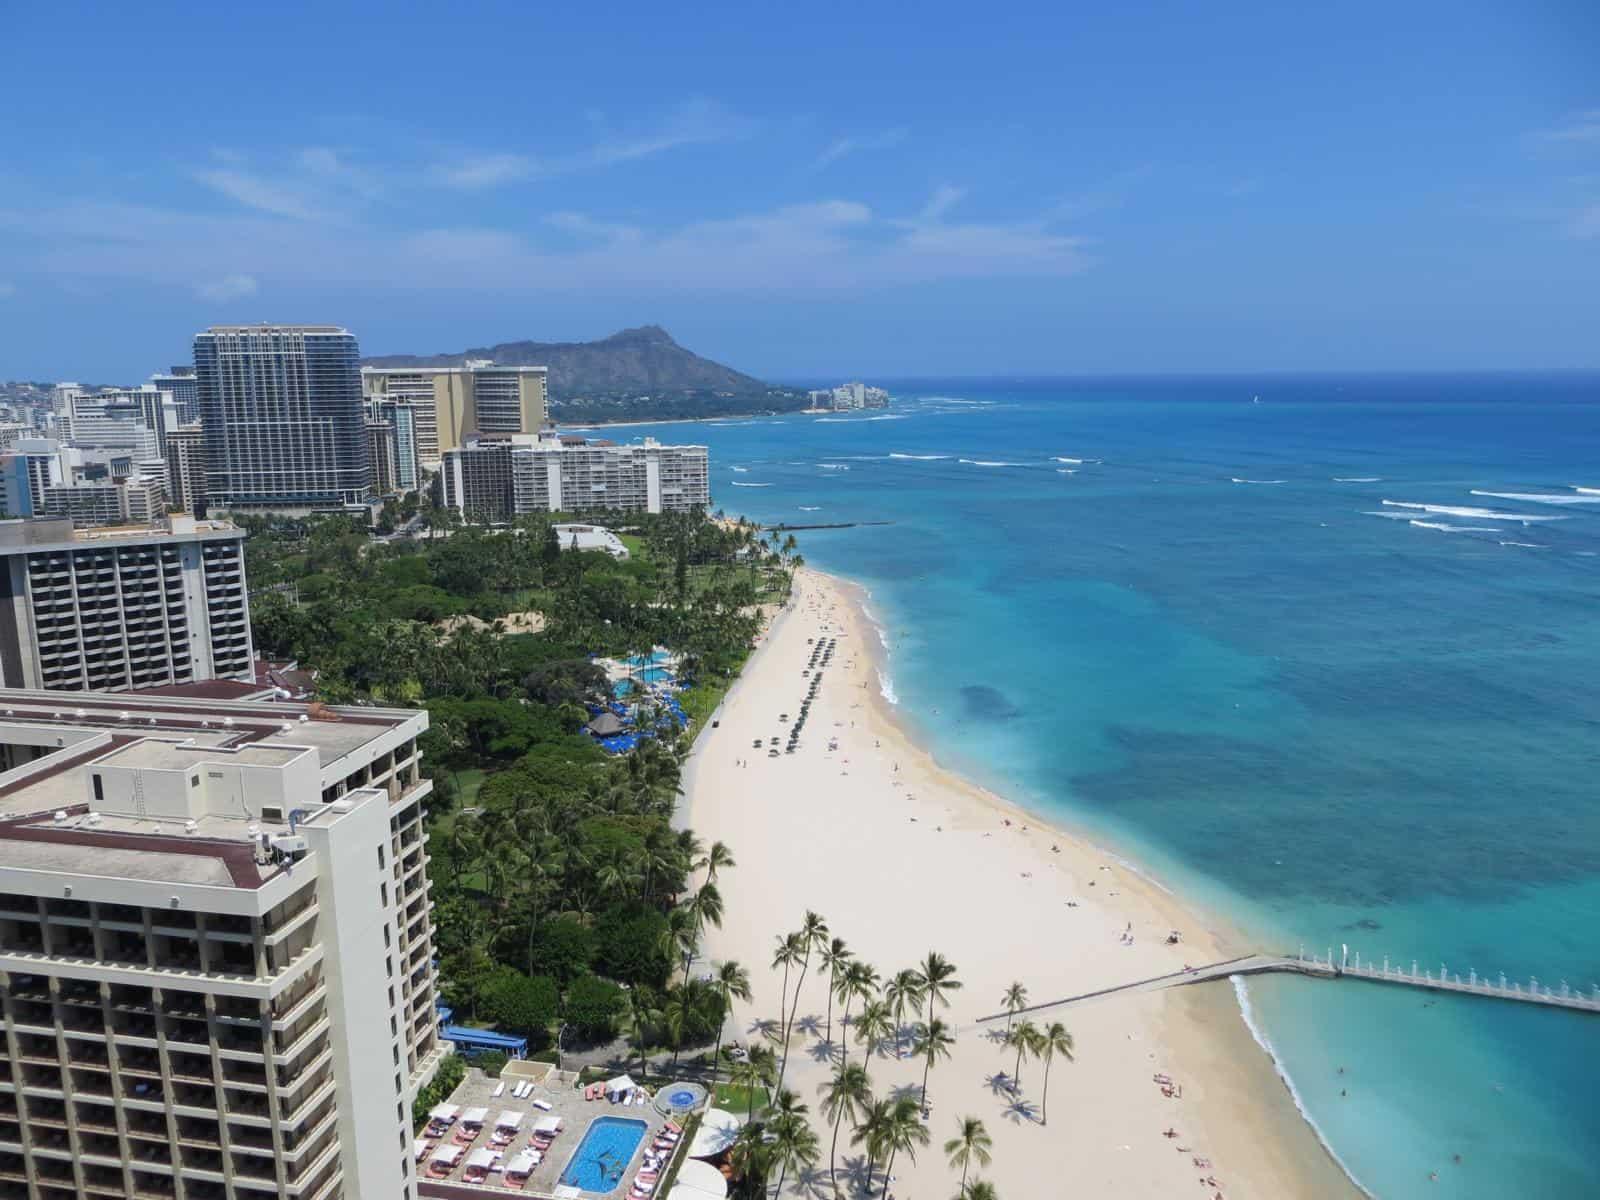 000 waikiki beach honolulu oahu hawaii von oben